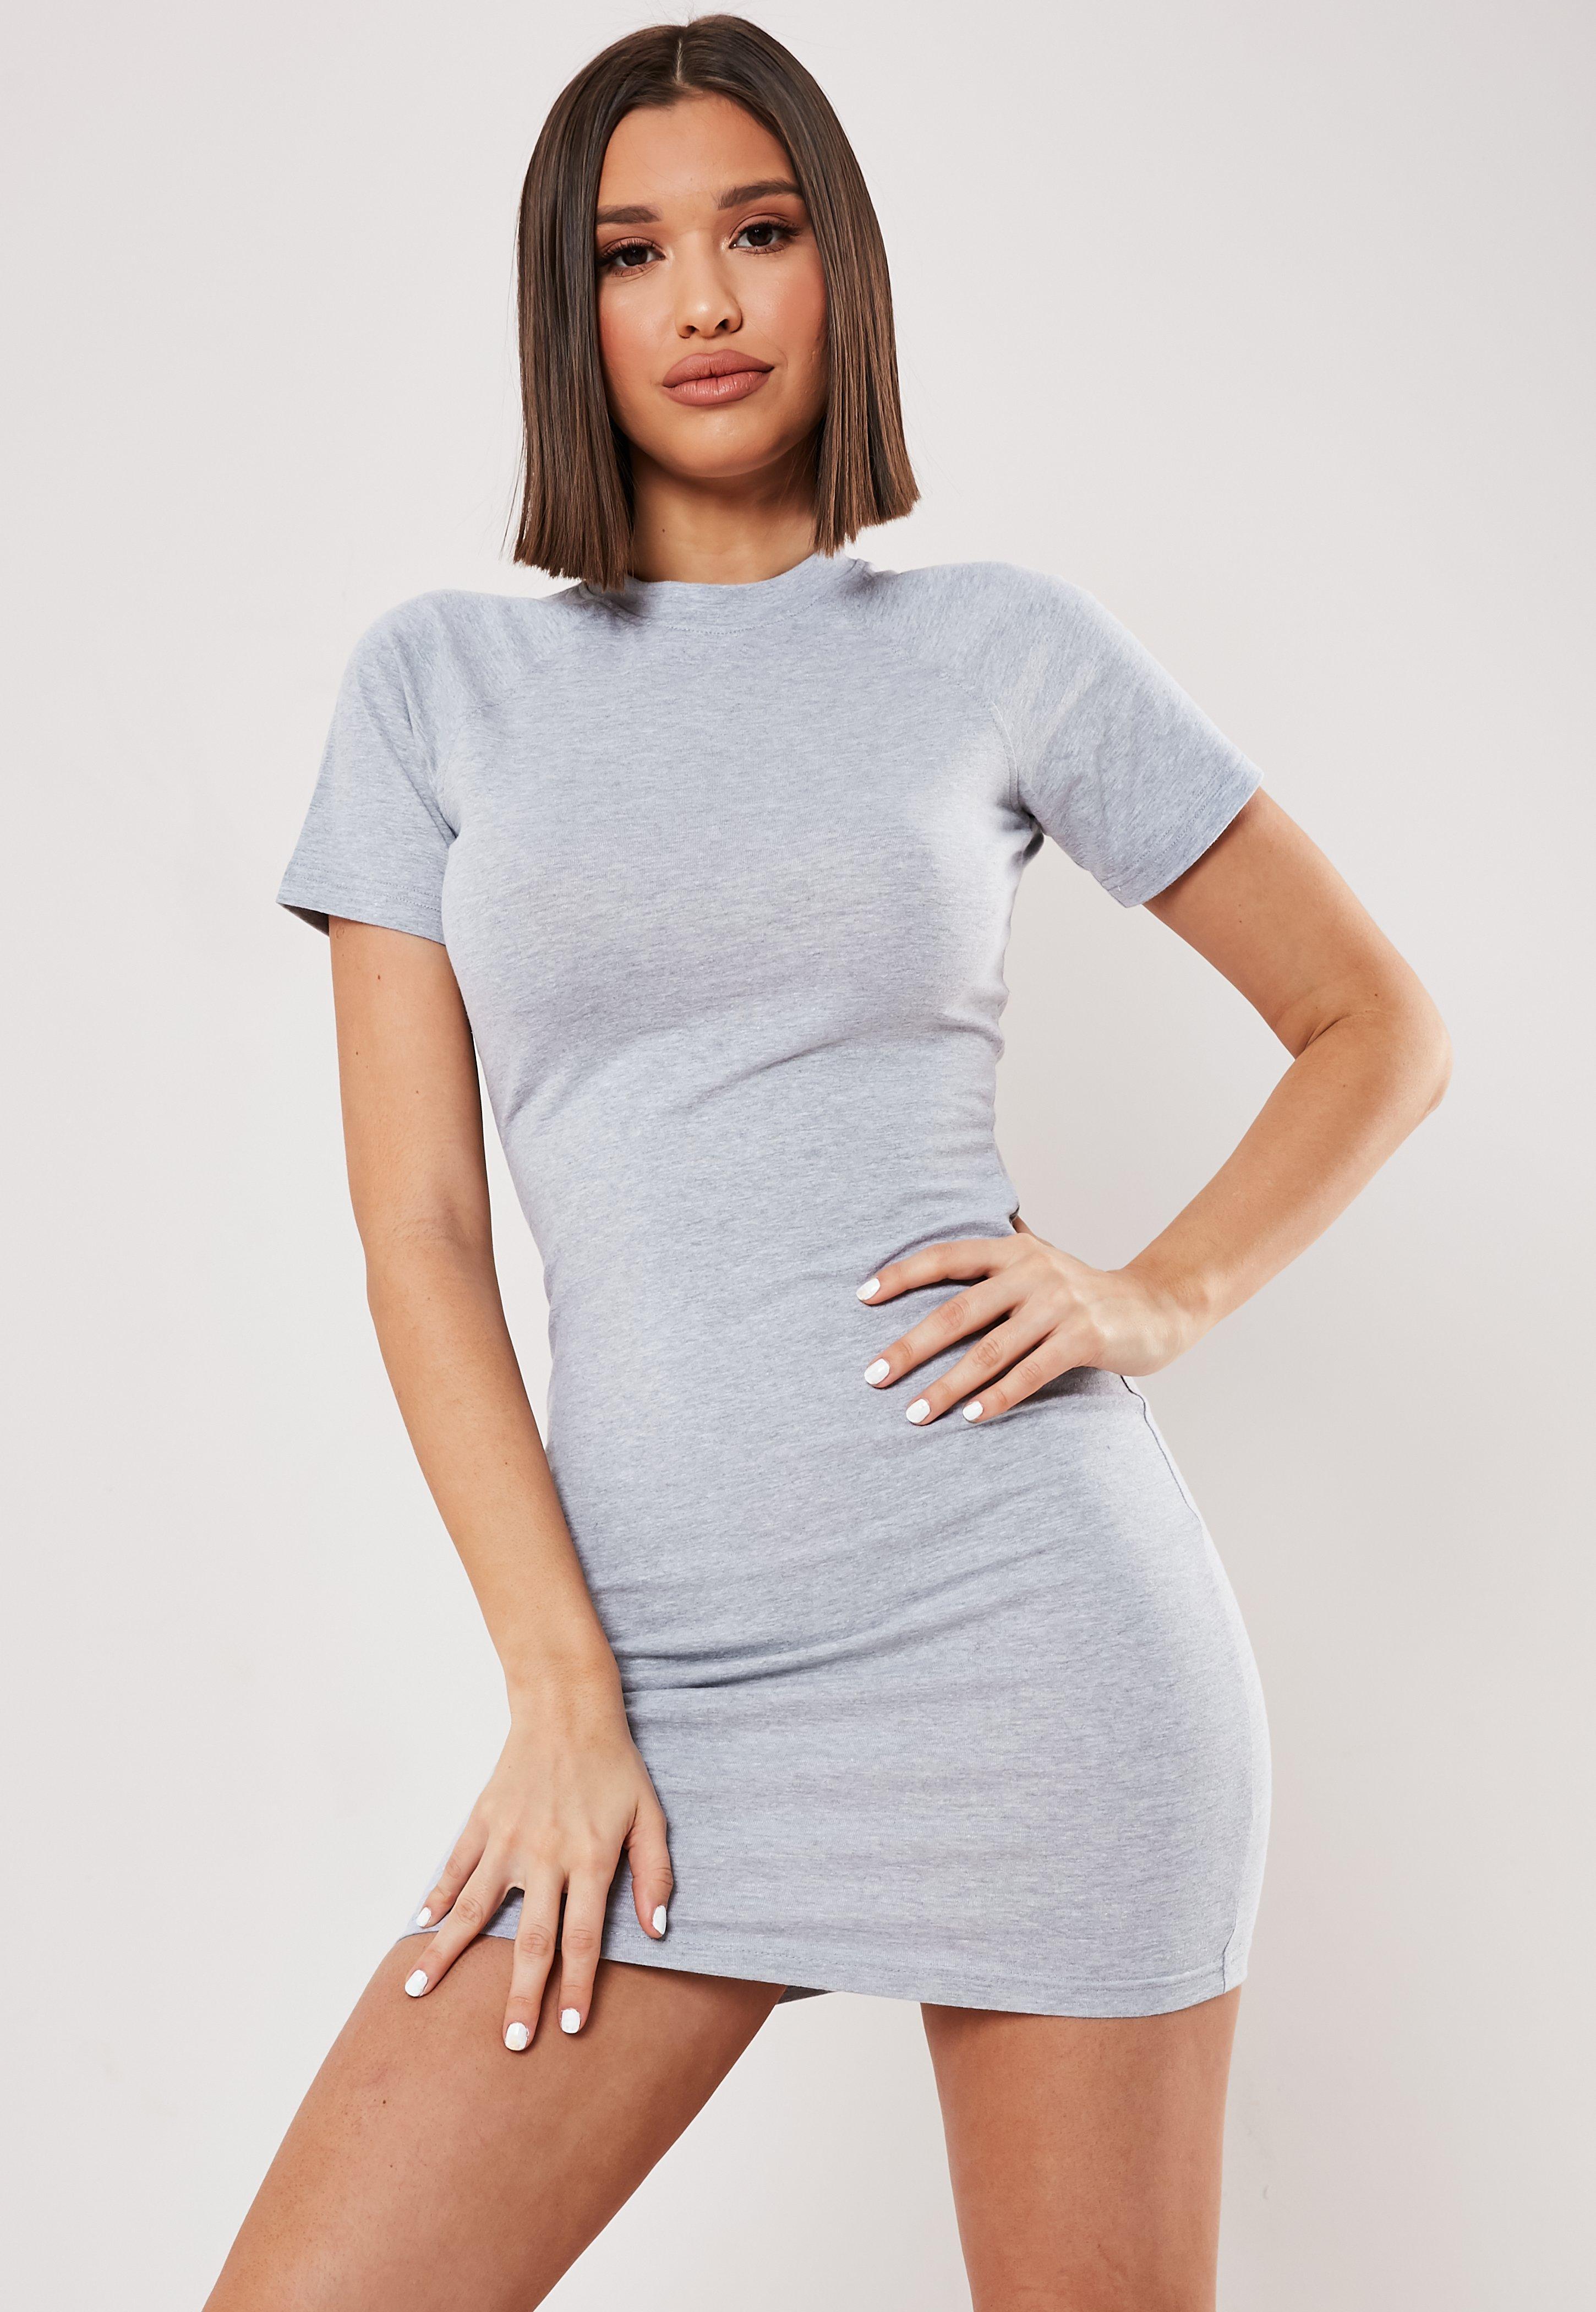 81eb077ff90ee Grey Dresses | Dark & Light Grey Dresses - Missguided Australia